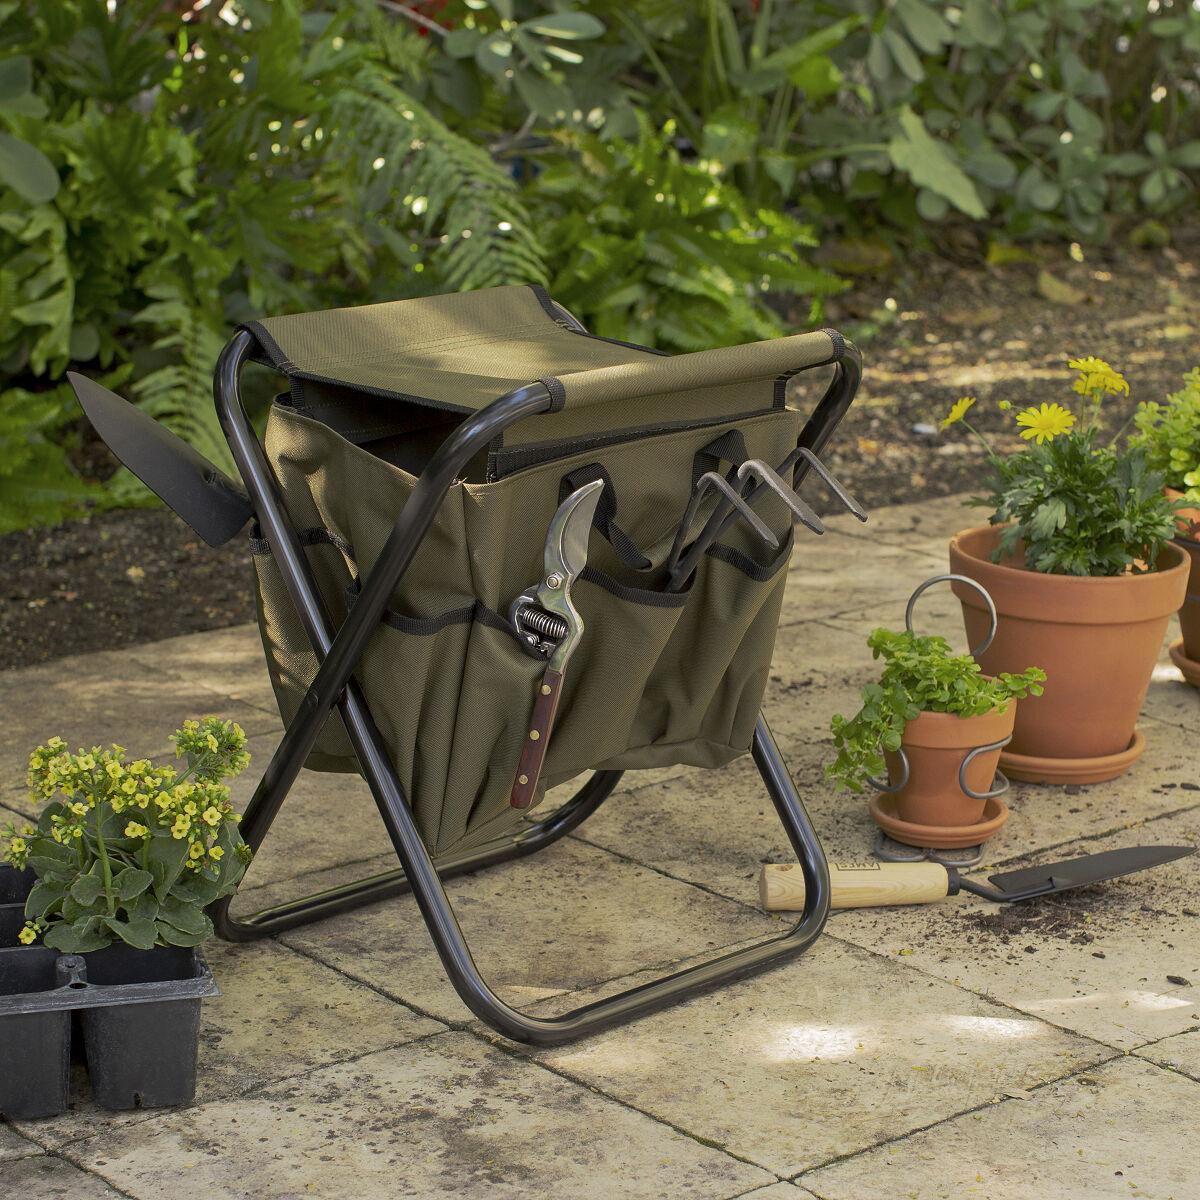 Gardener S Tool Seat Tool Seat Garden Work Stool